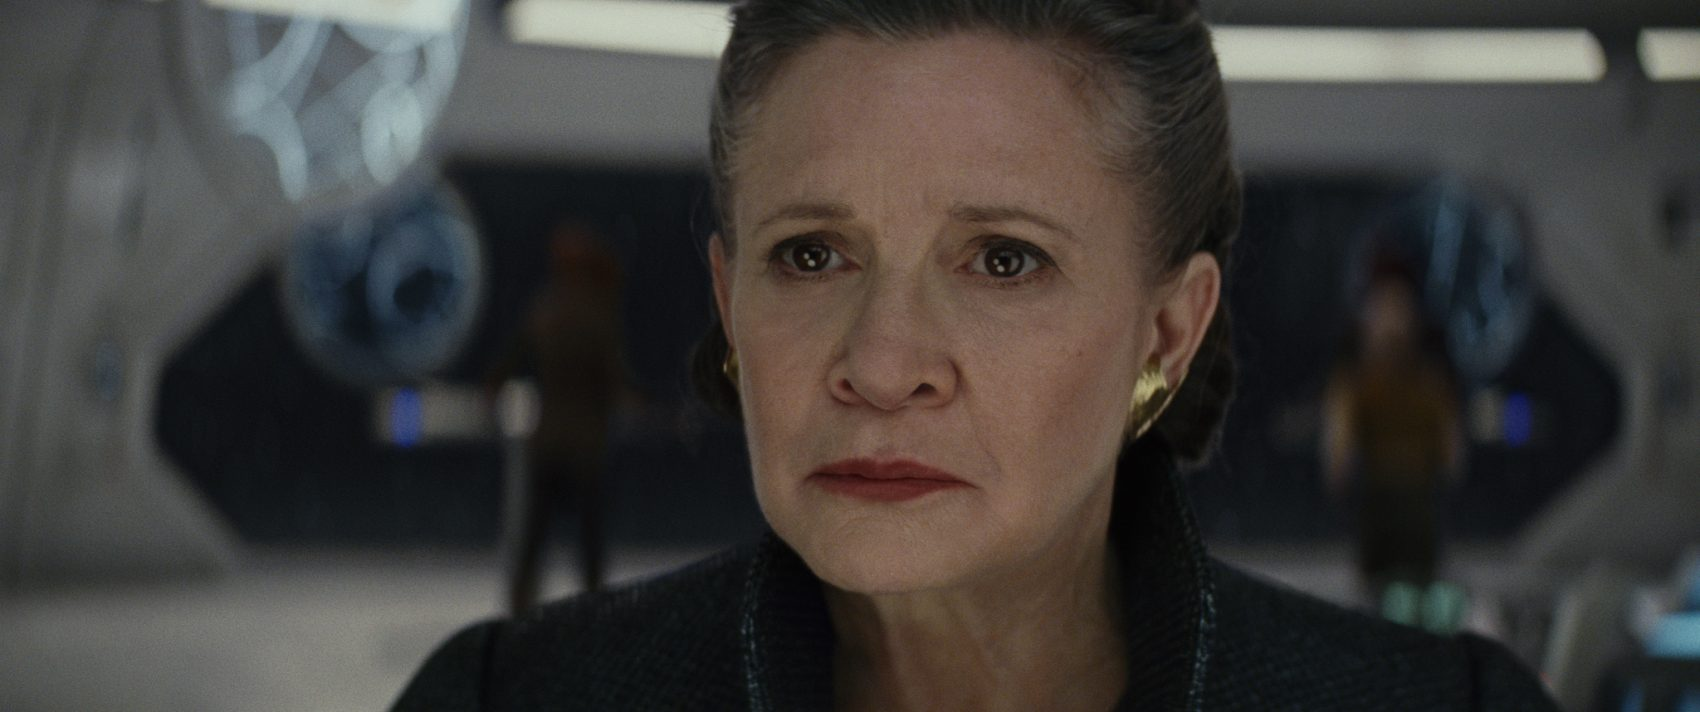 Resistance Isn't Futile: 'Star Wars: The Last Jedi' Delivers